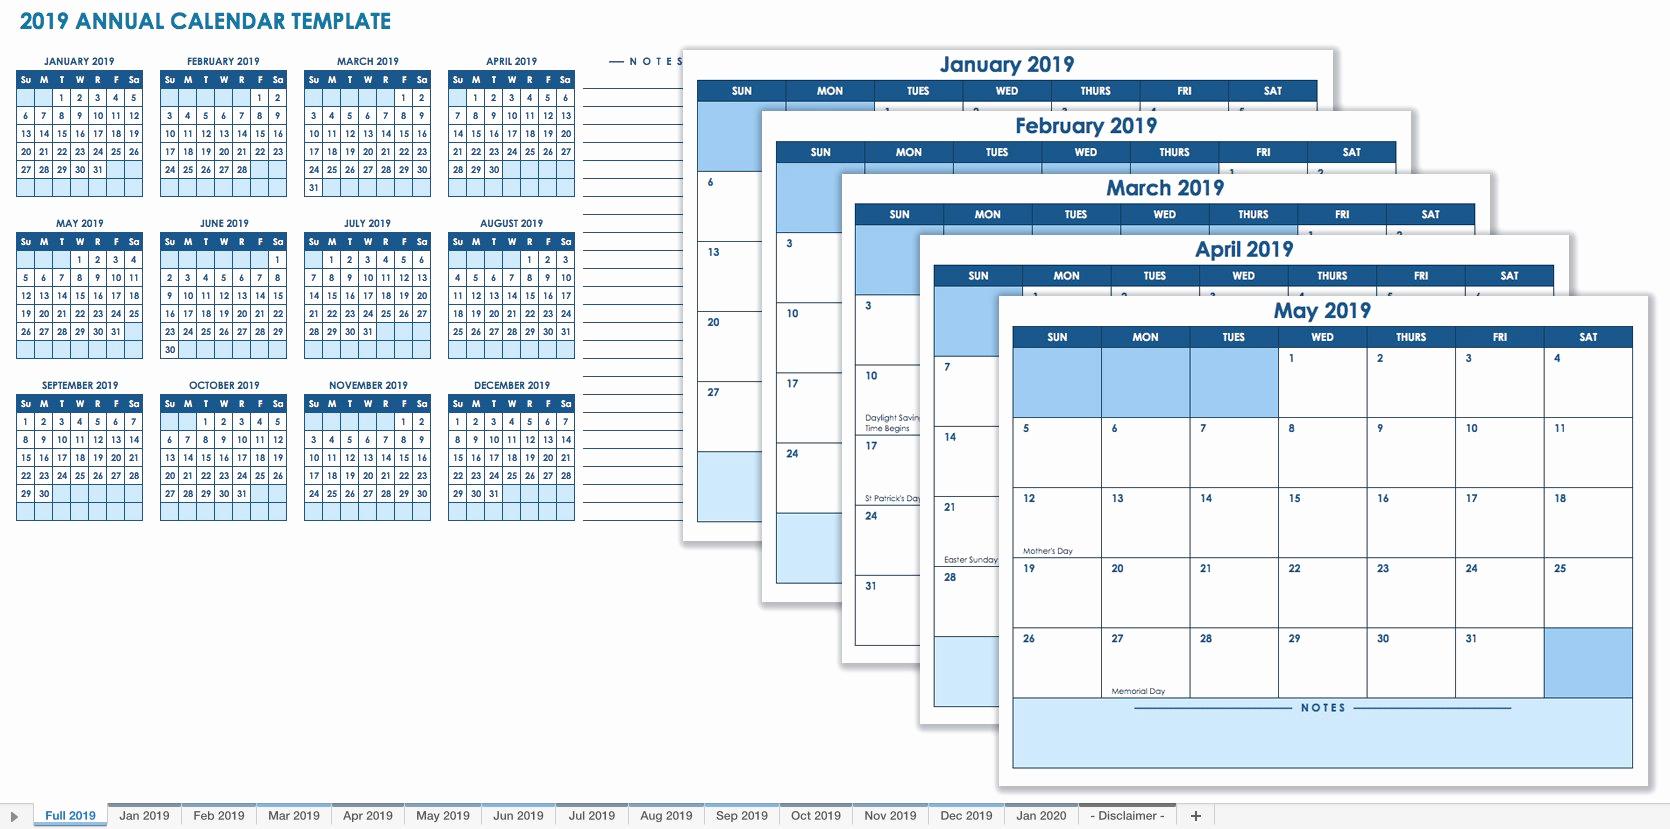 Excel Calendar 2019 Template Elegant 15 Free Monthly Calendar Templates